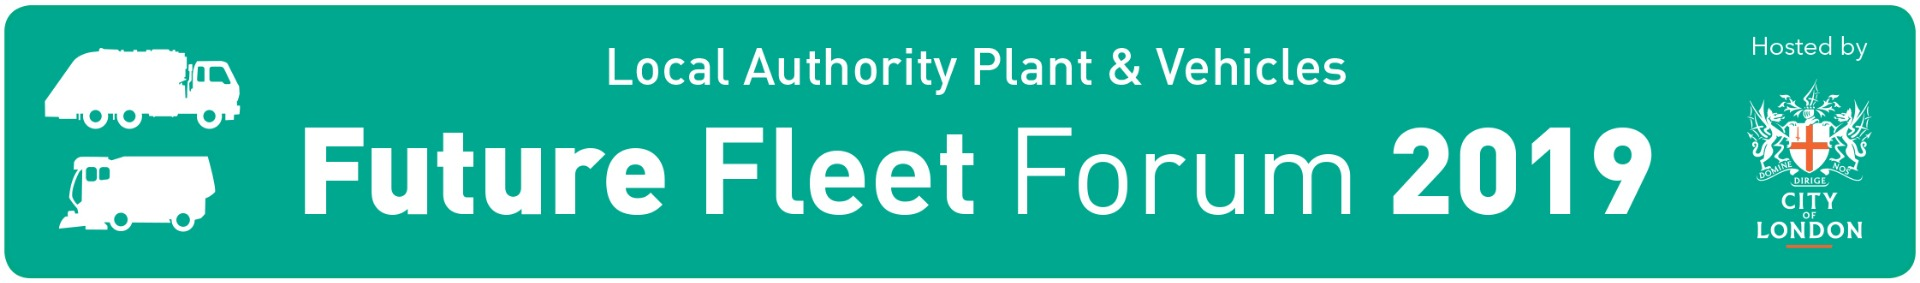 future-fleet19-full-logo-strip